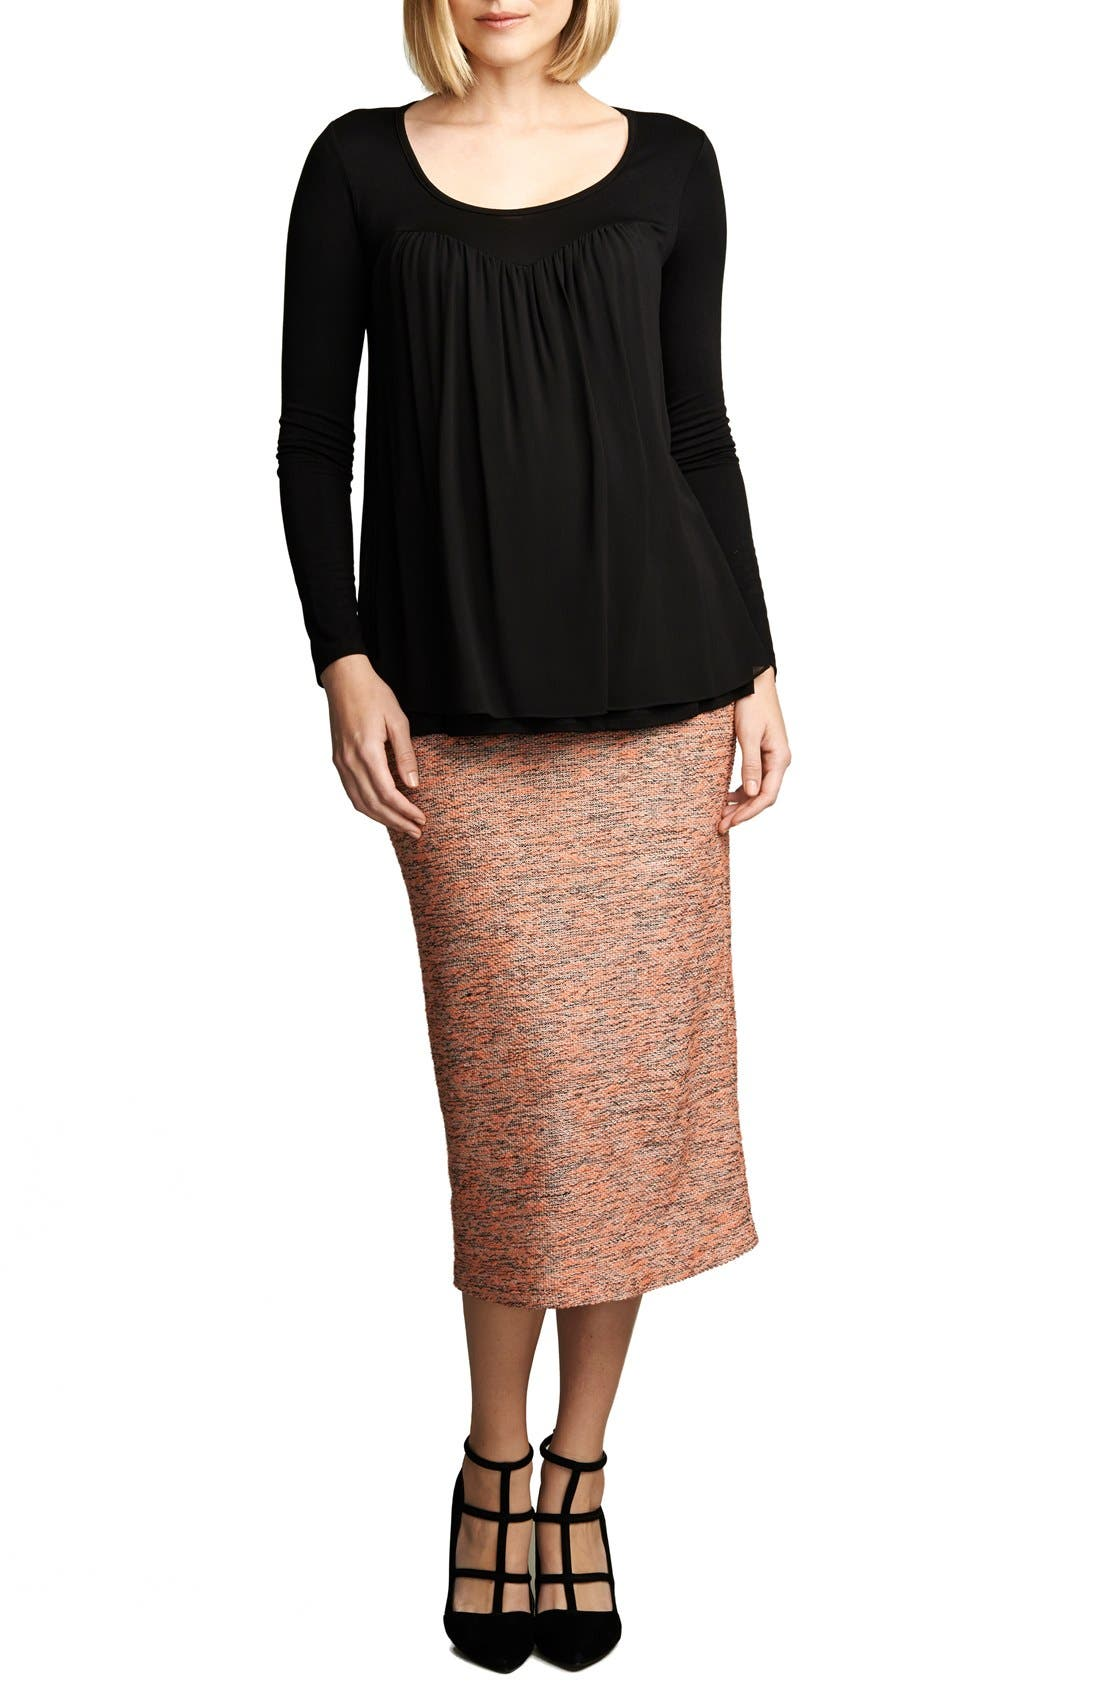 MATERNAL AMERICA Belly Support MaternityPencil Skirt